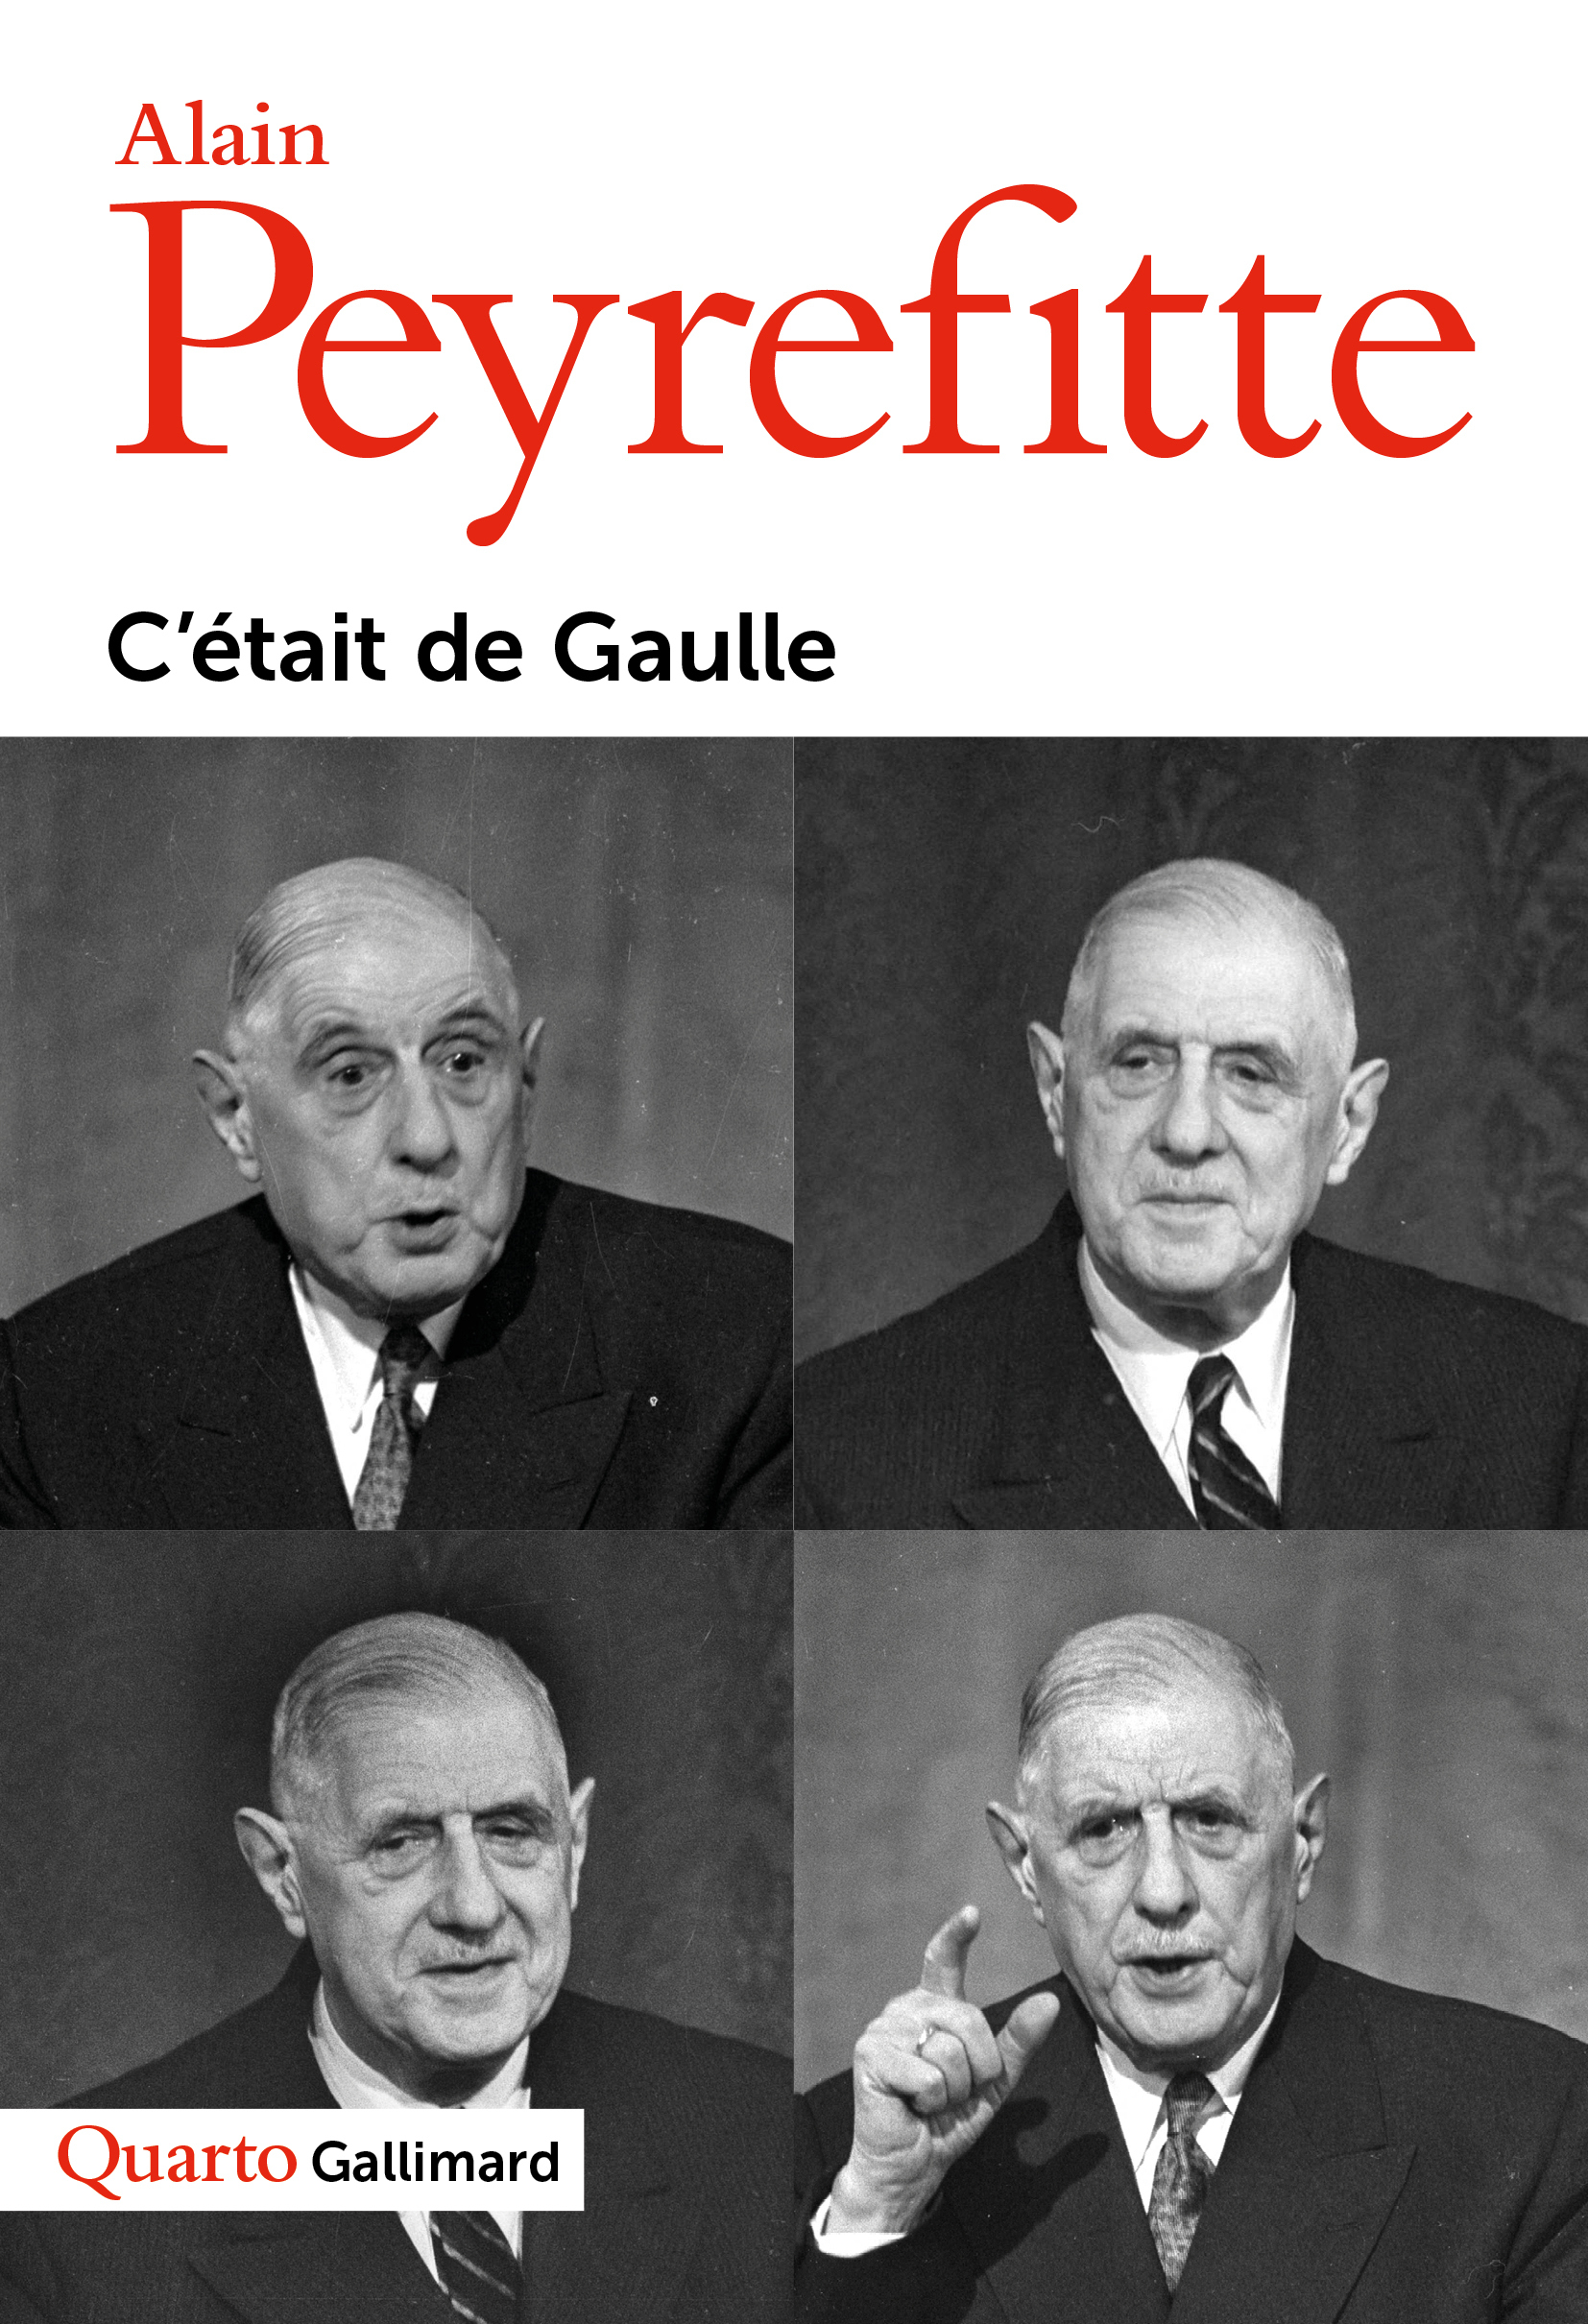 C'ETAIT DE GAULLE